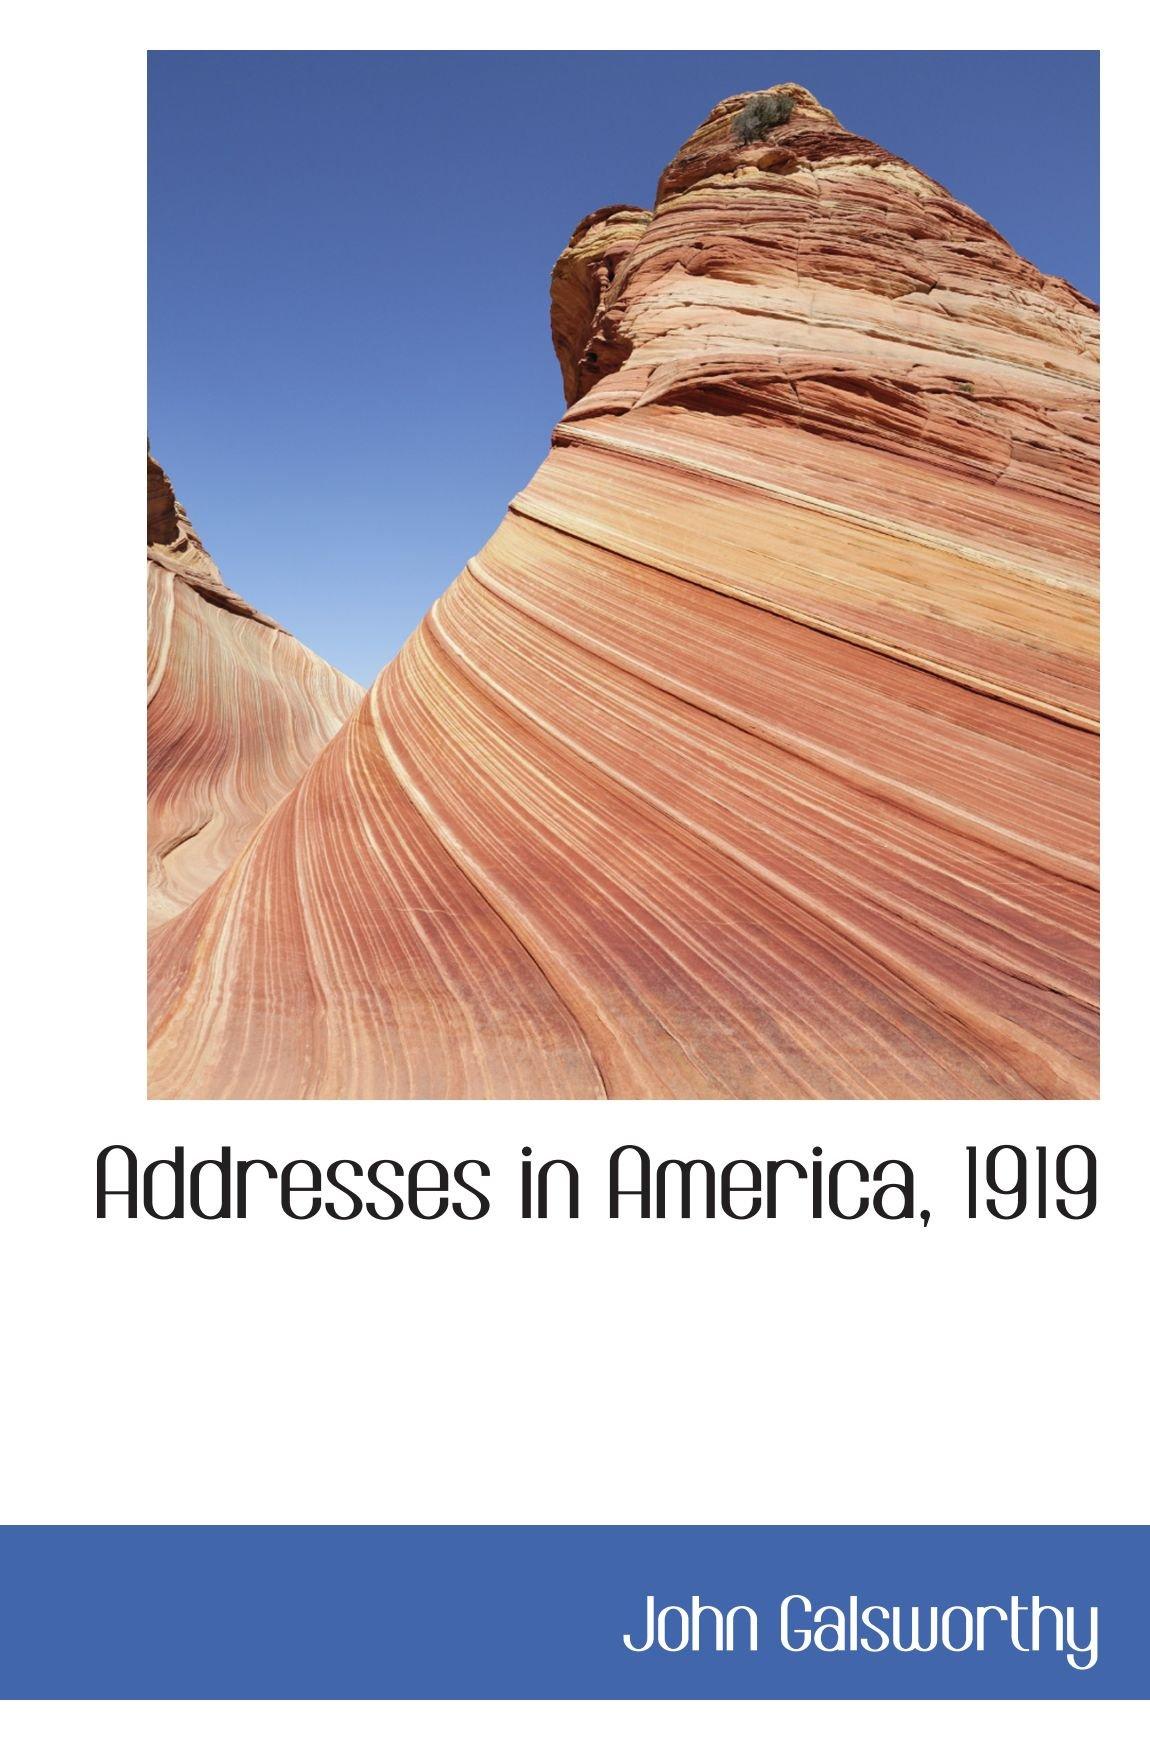 Download Addresses in America, 1919 pdf